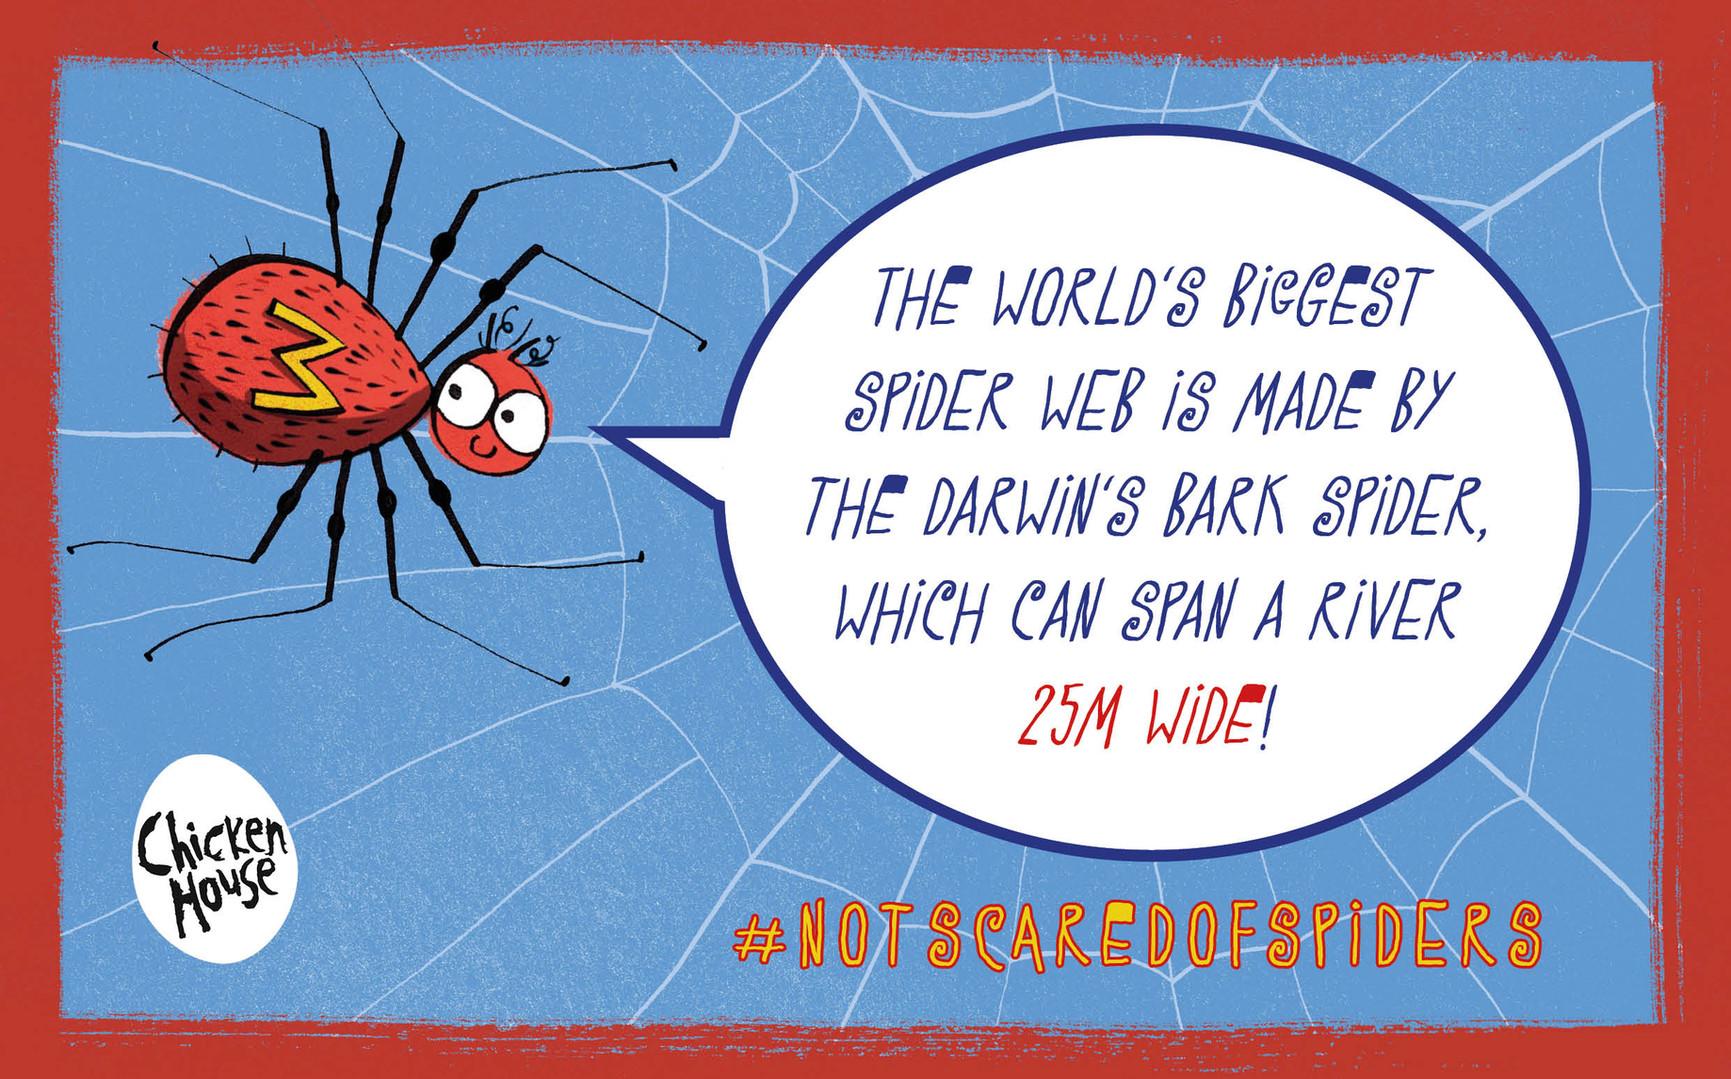 Milton spider fact 2.jpg